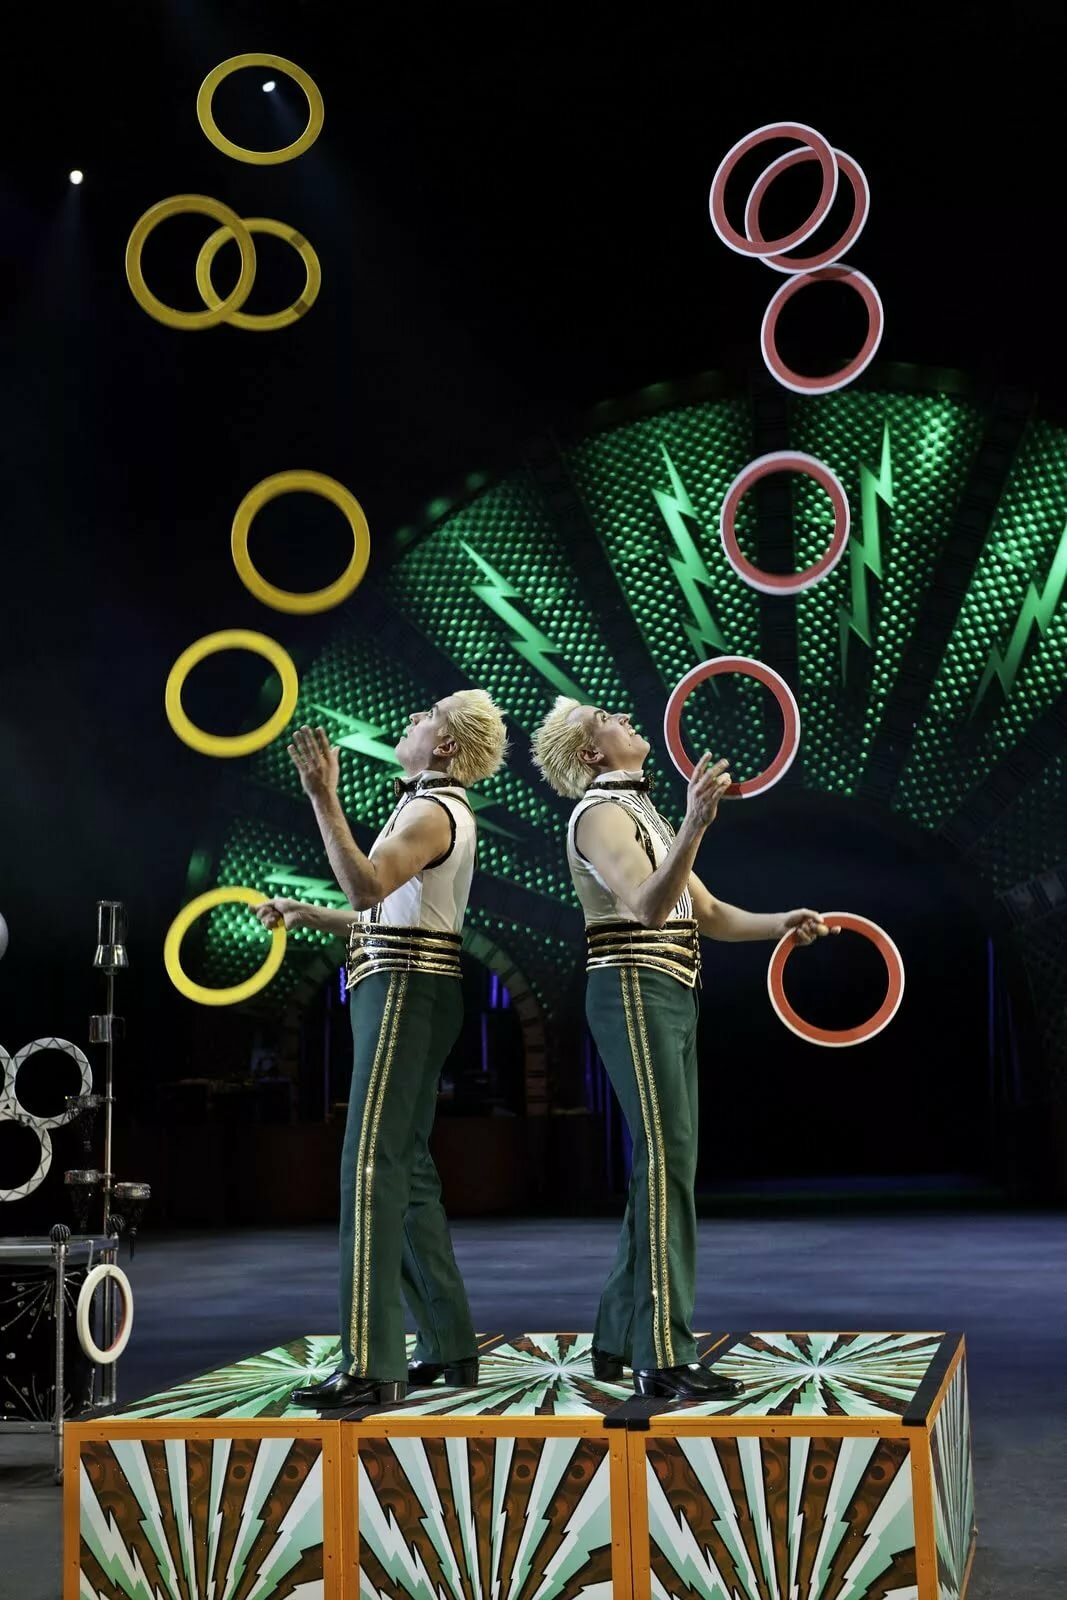 жонглер в цирке картинки